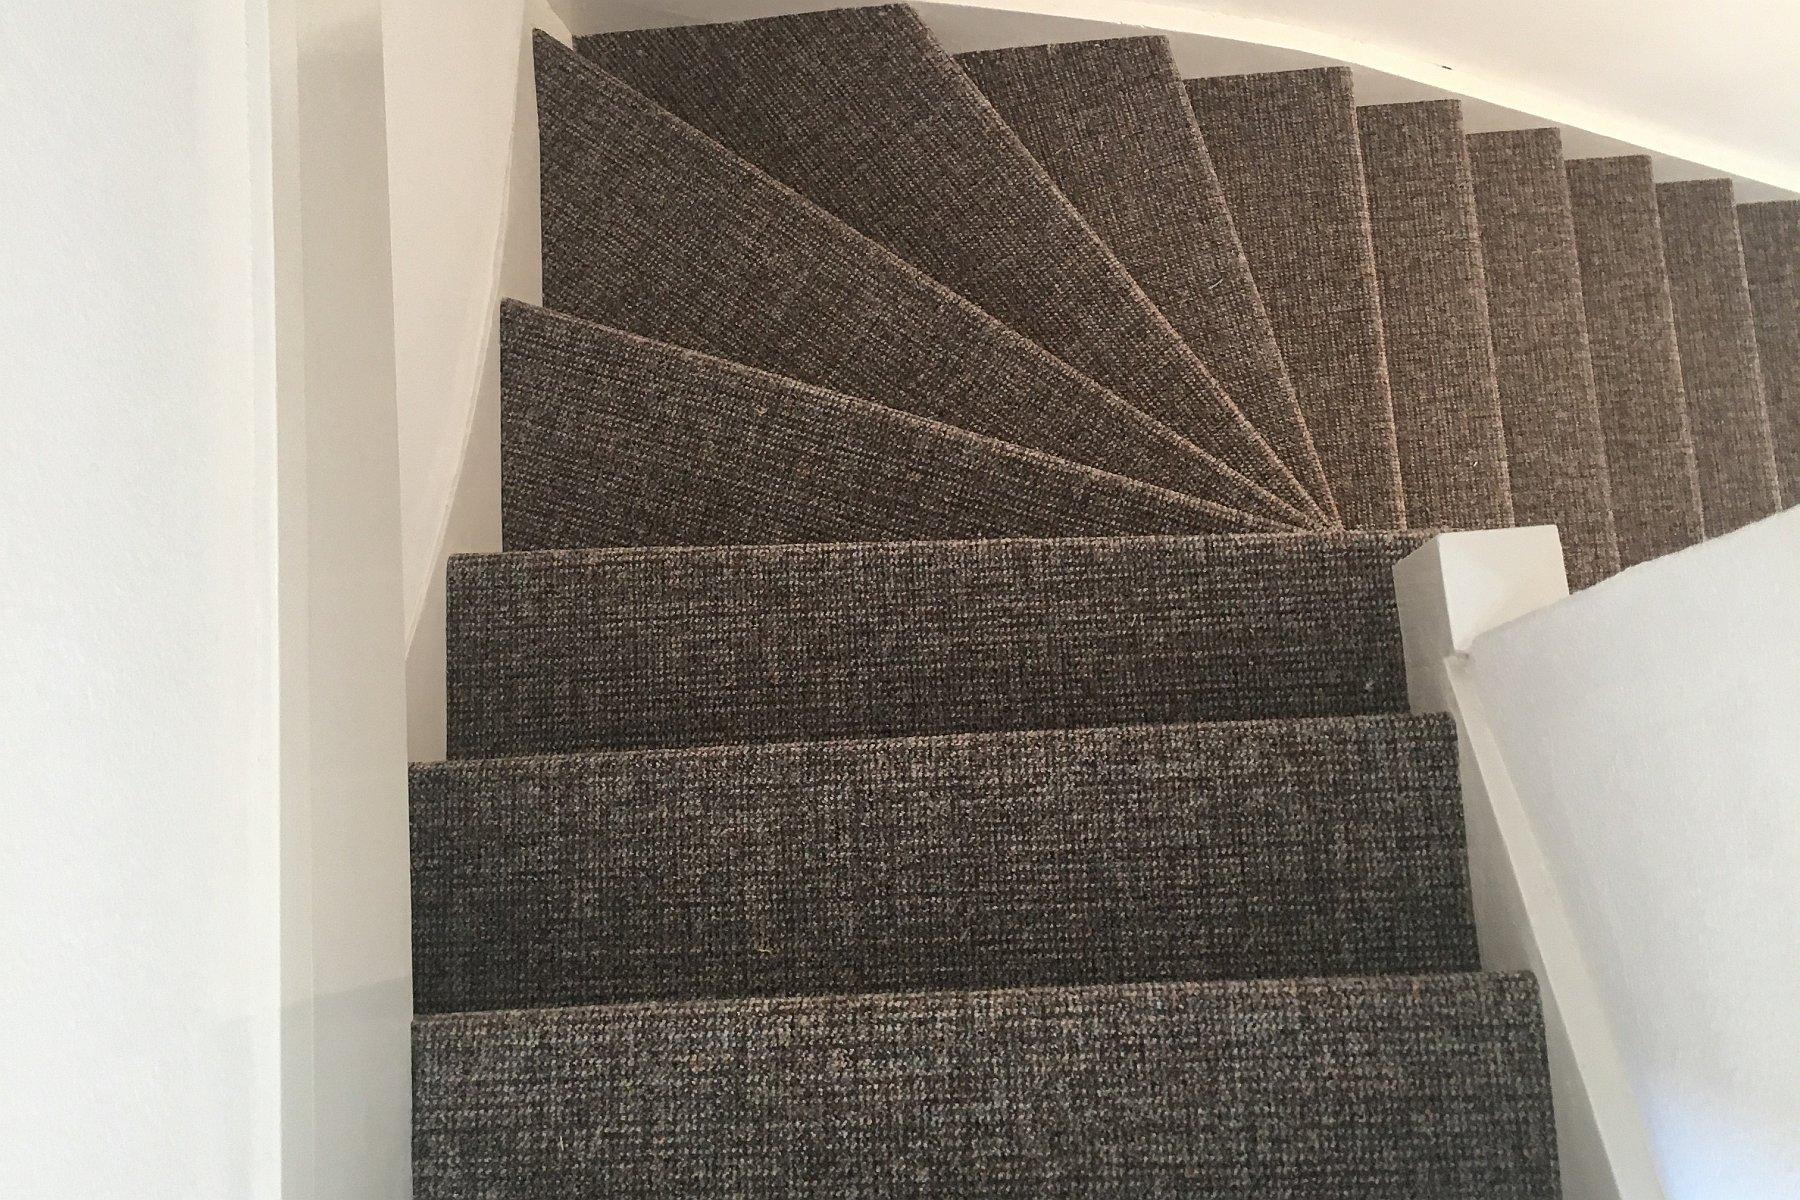 Tapijt Laten Leggen : Tapijthal hoogkerk pvc vloer vinyl tapijt laminaat